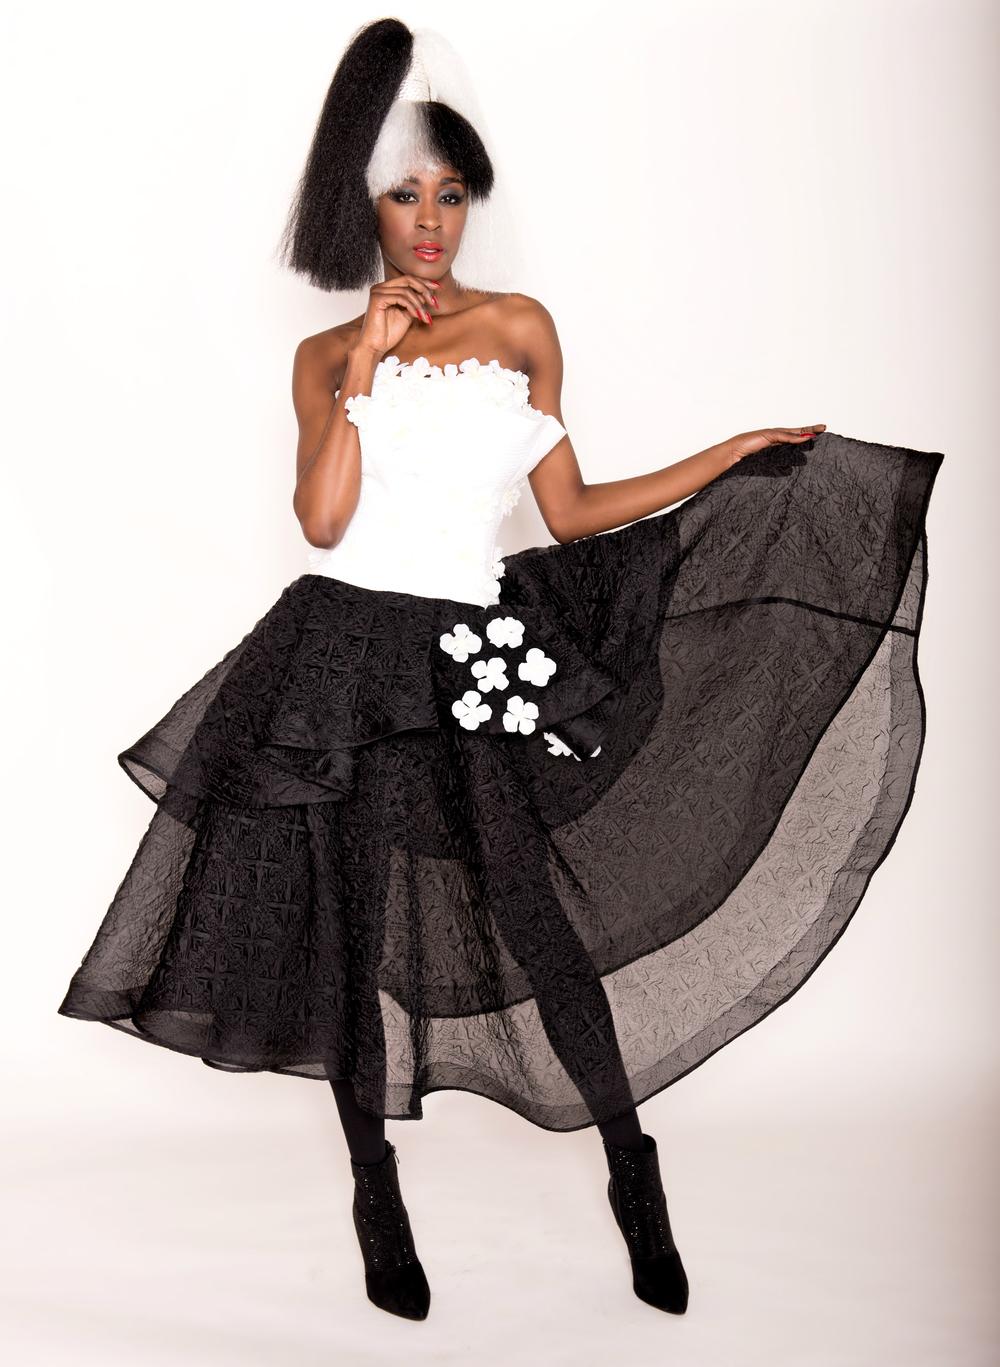 nine-gleyzer-designer-dress-7.jpg